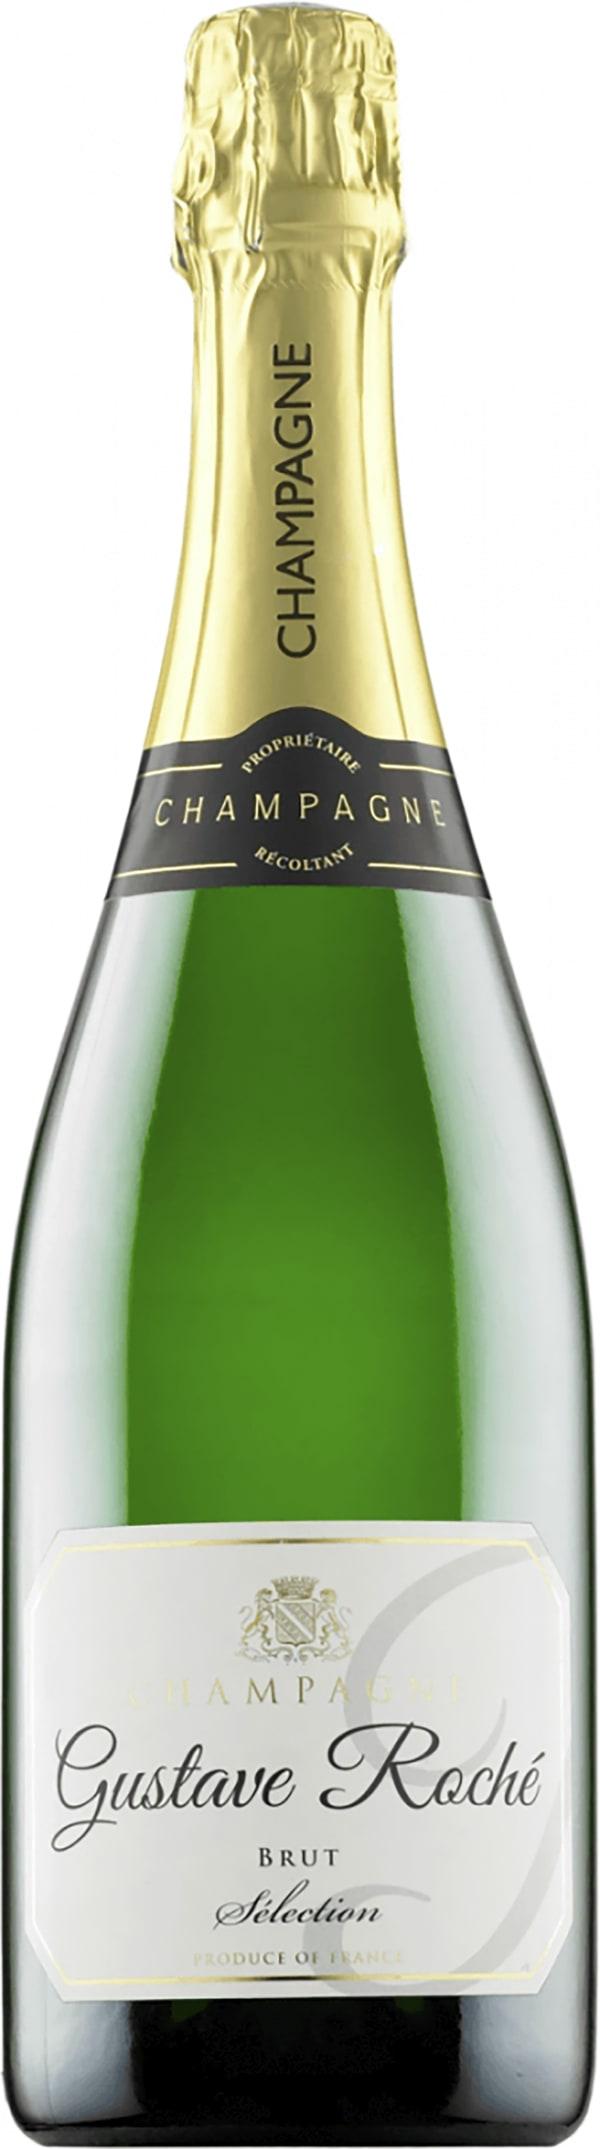 Gustave Roché Champagne Brut